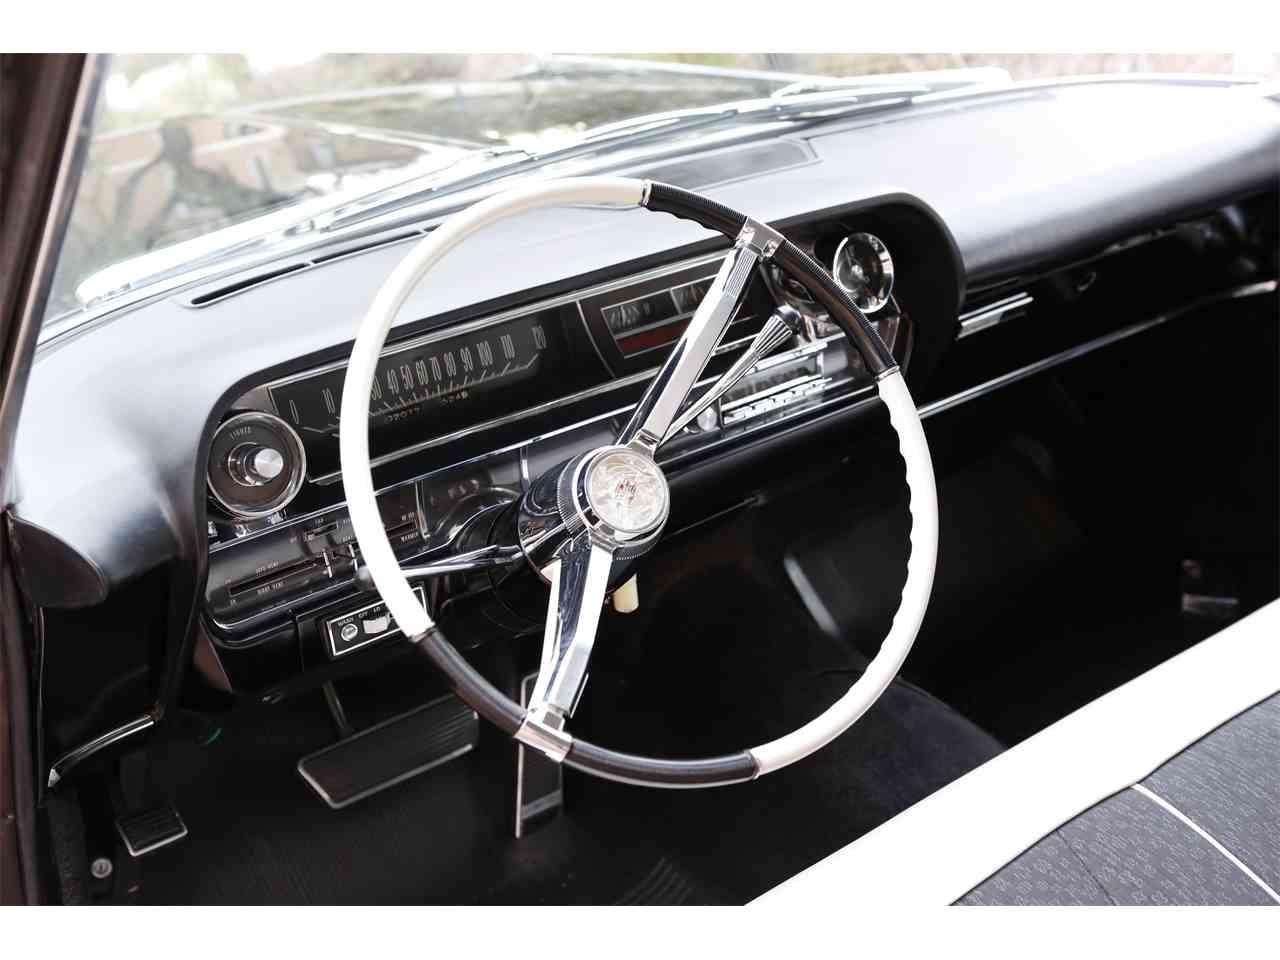 1964 cadillac coupe deville for sale cc 814516. Black Bedroom Furniture Sets. Home Design Ideas